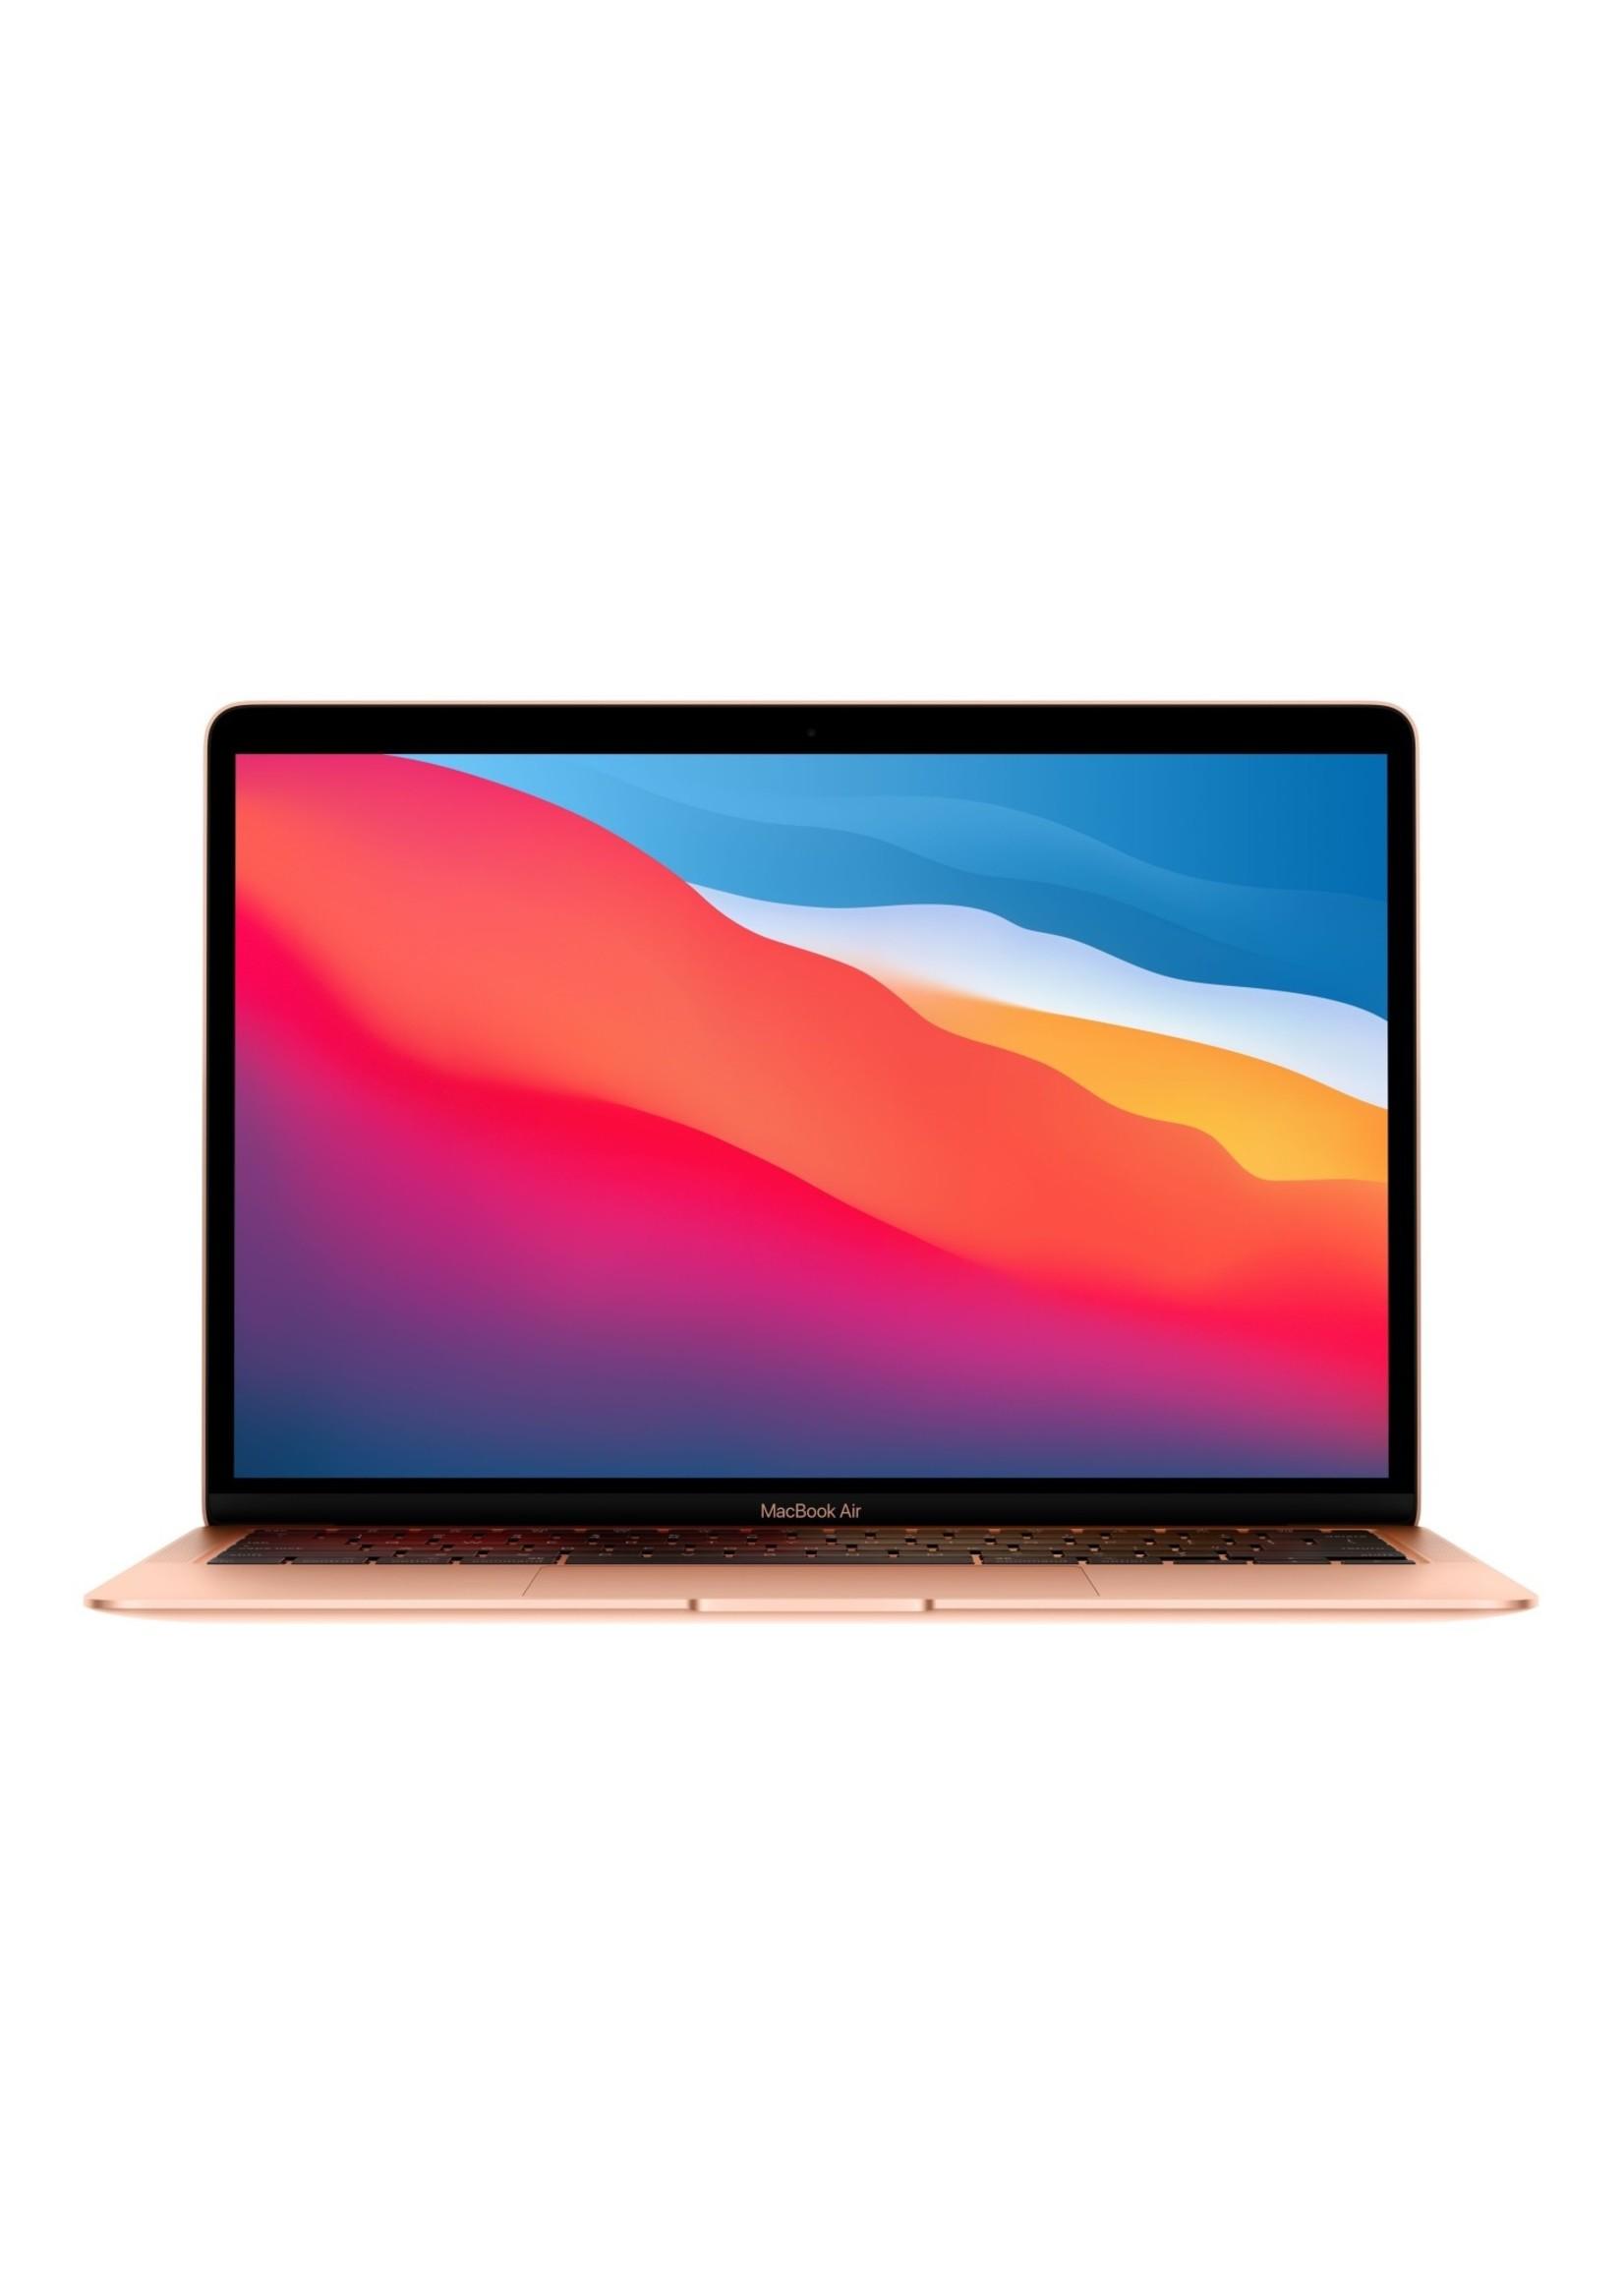 Apple MacBook Air 13-inch 512GB Gold